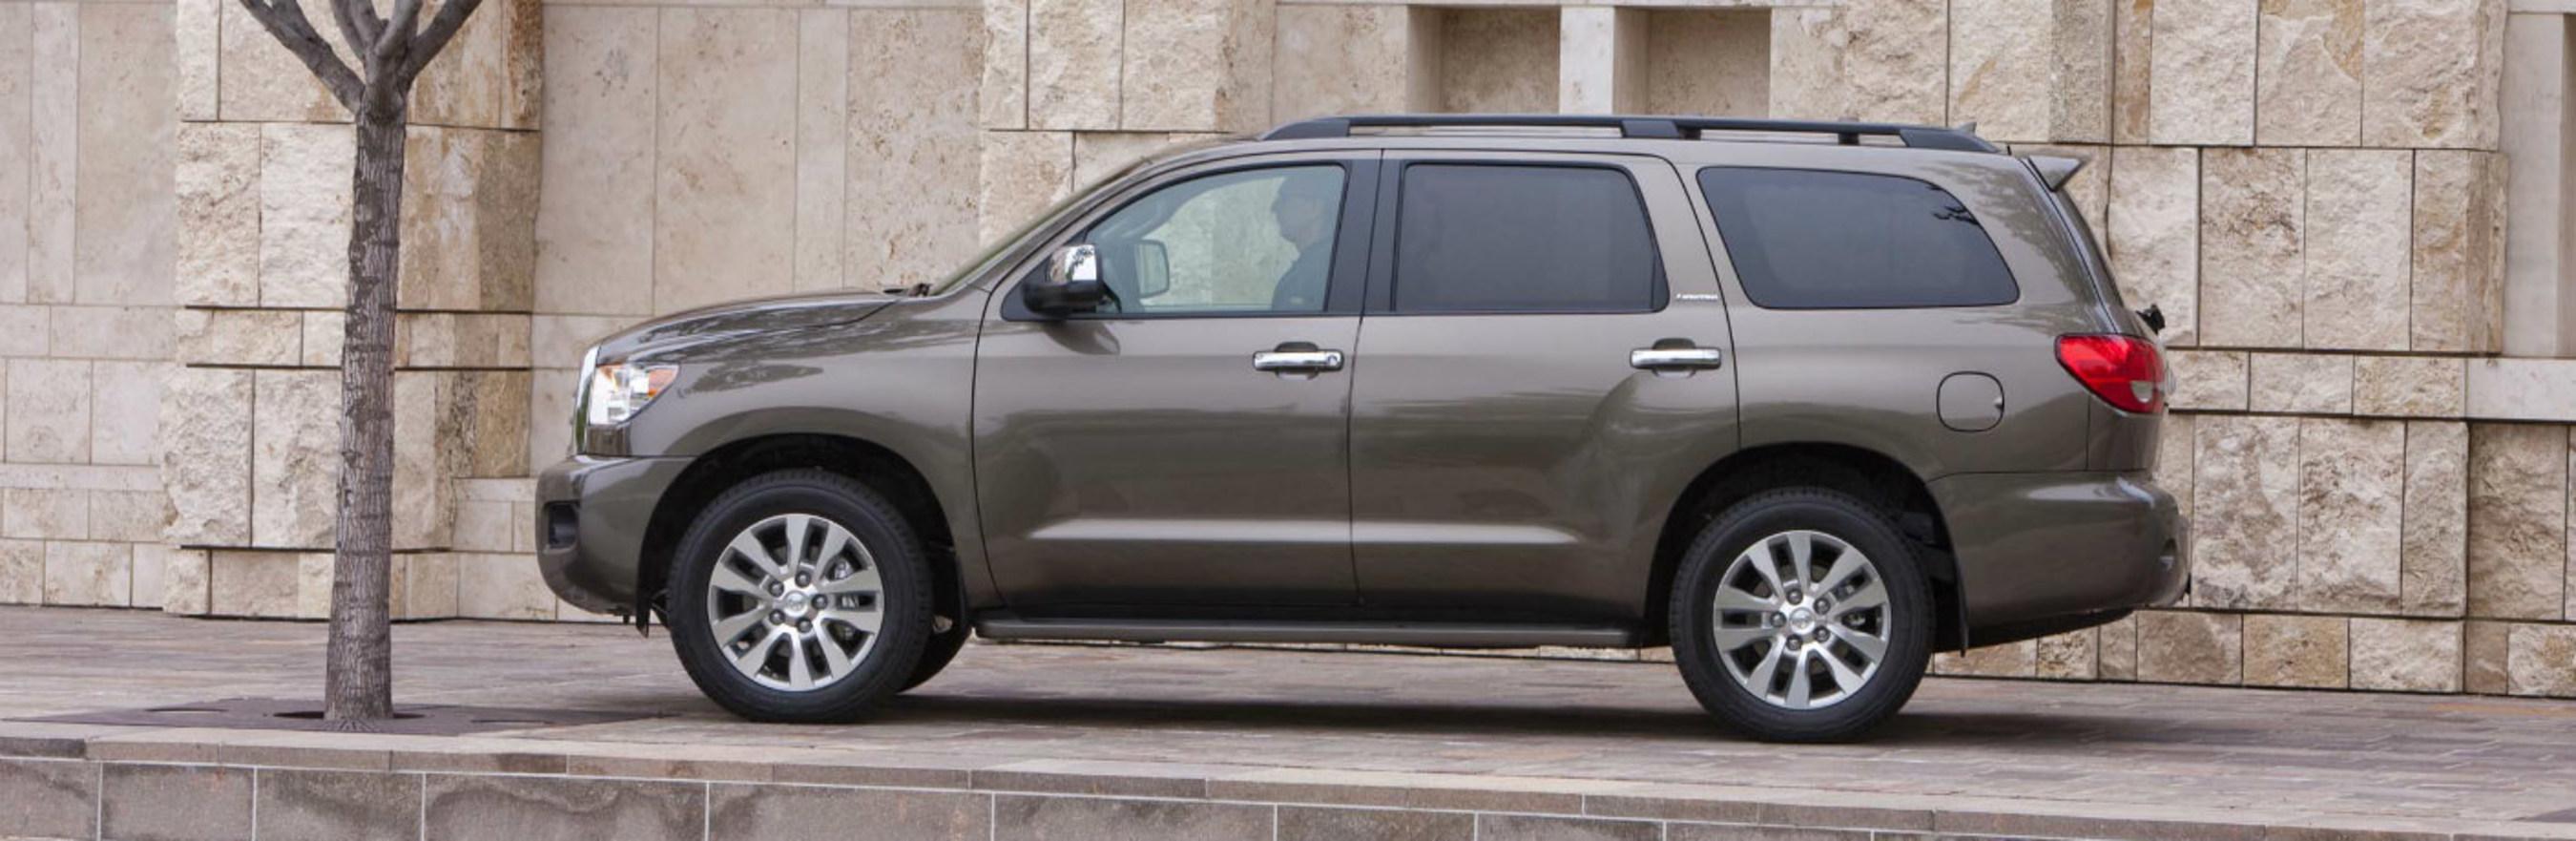 Toyota of Naperville puts luxury SUVs on center stage